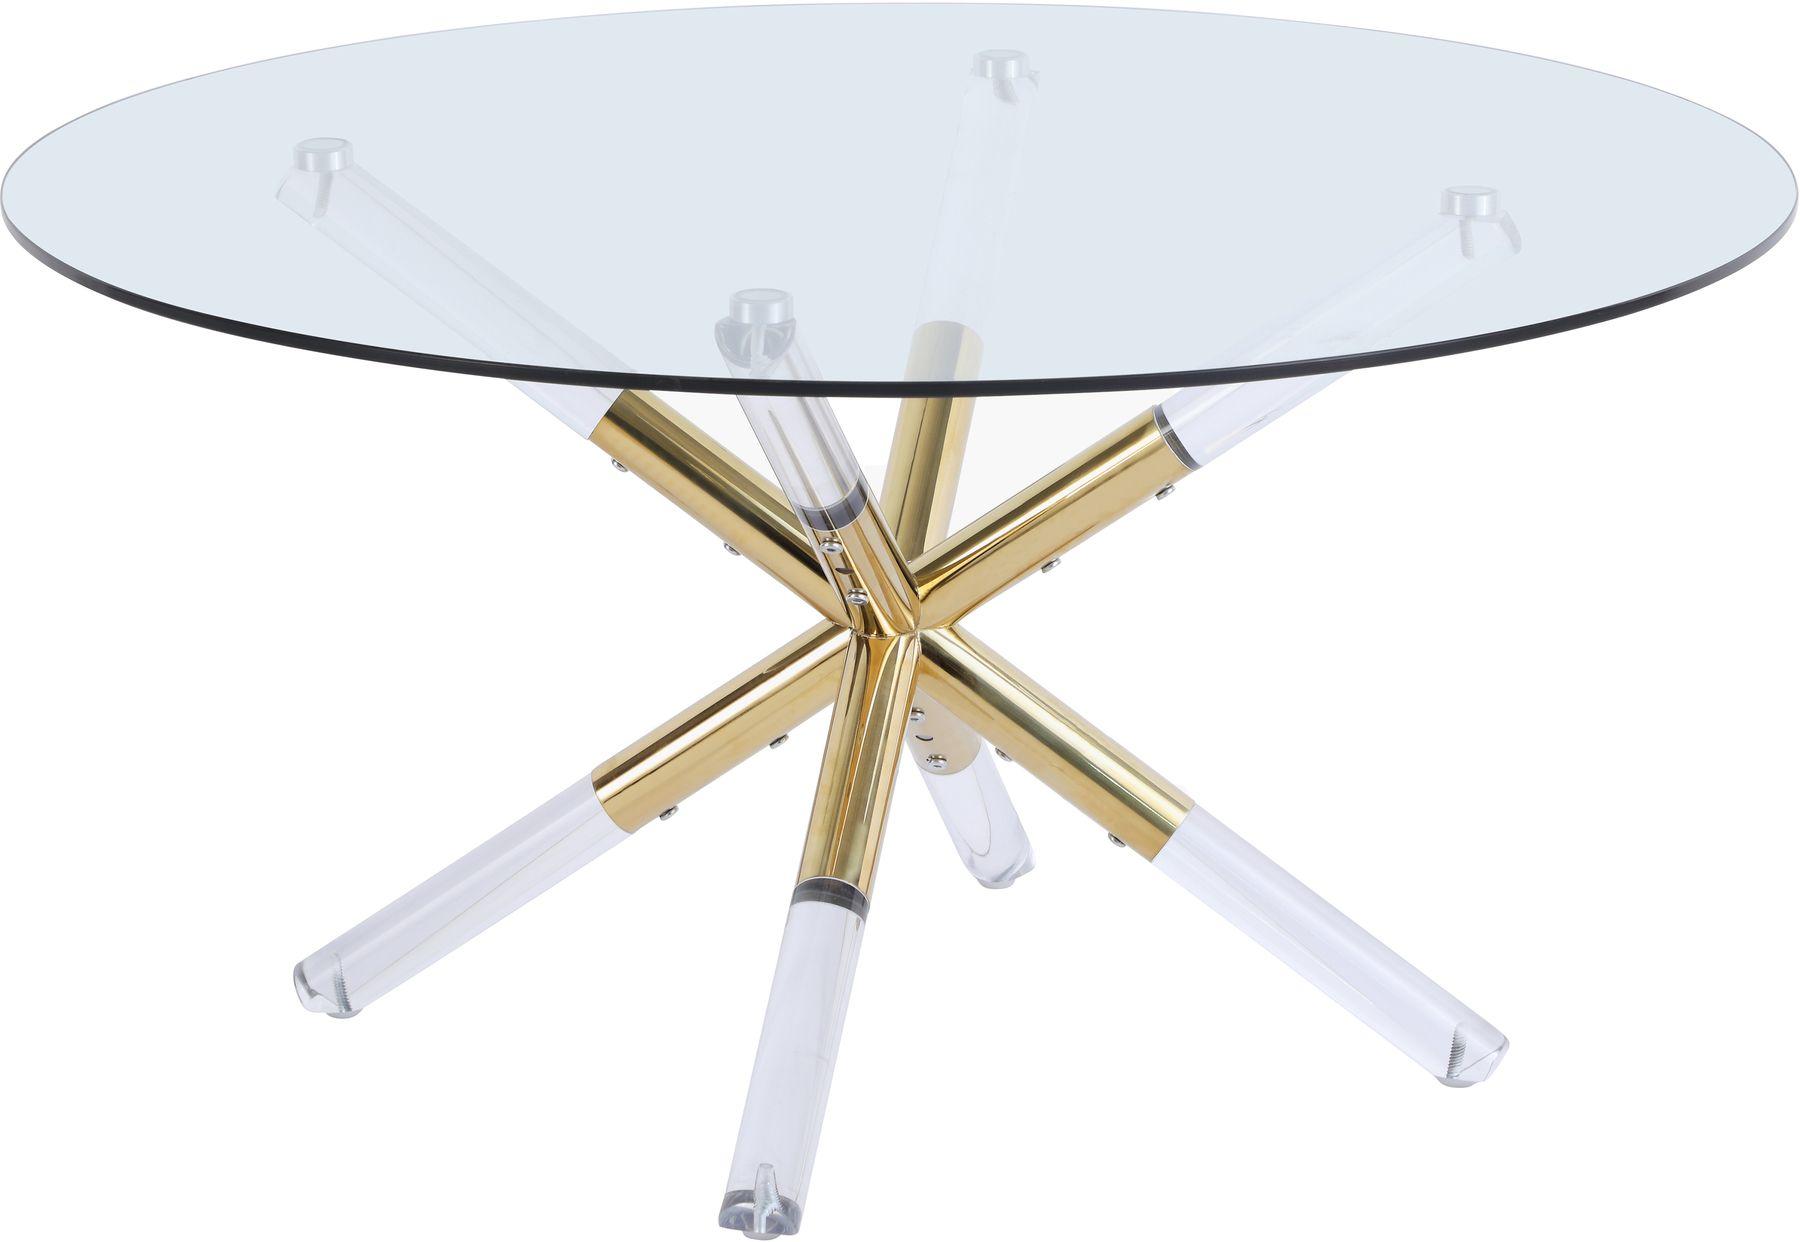 Mercury Coffee Table 284 Meridian Furniture Coffee Tables Gold Coffee Table Tempered Glass Table Top Meridian Furniture [ 1242 x 1800 Pixel ]